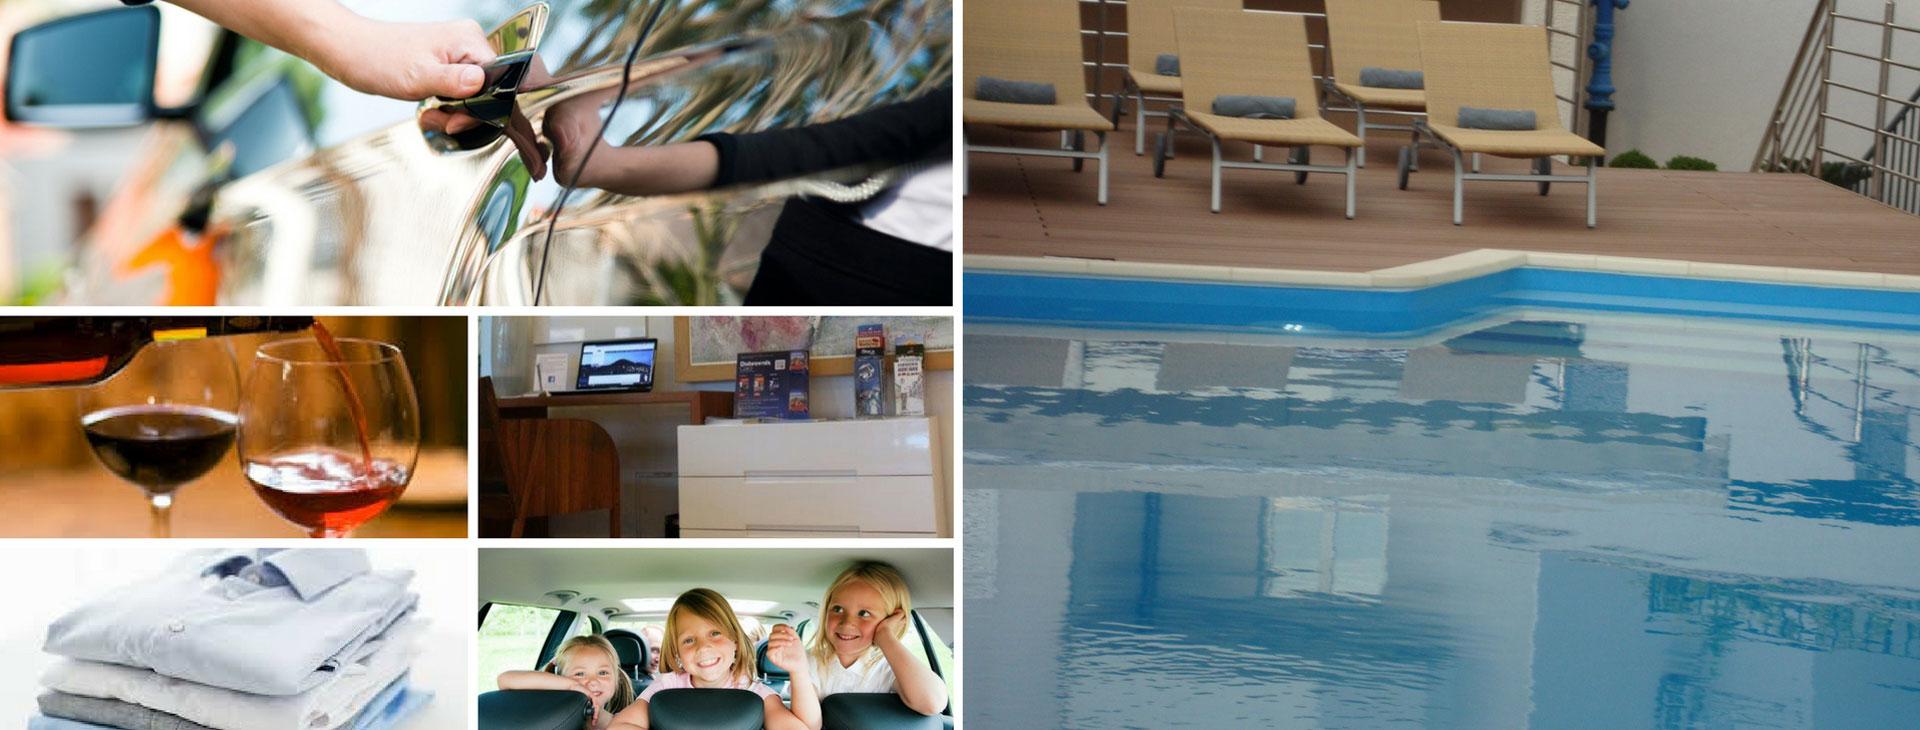 Dubrovnik hotel amenities